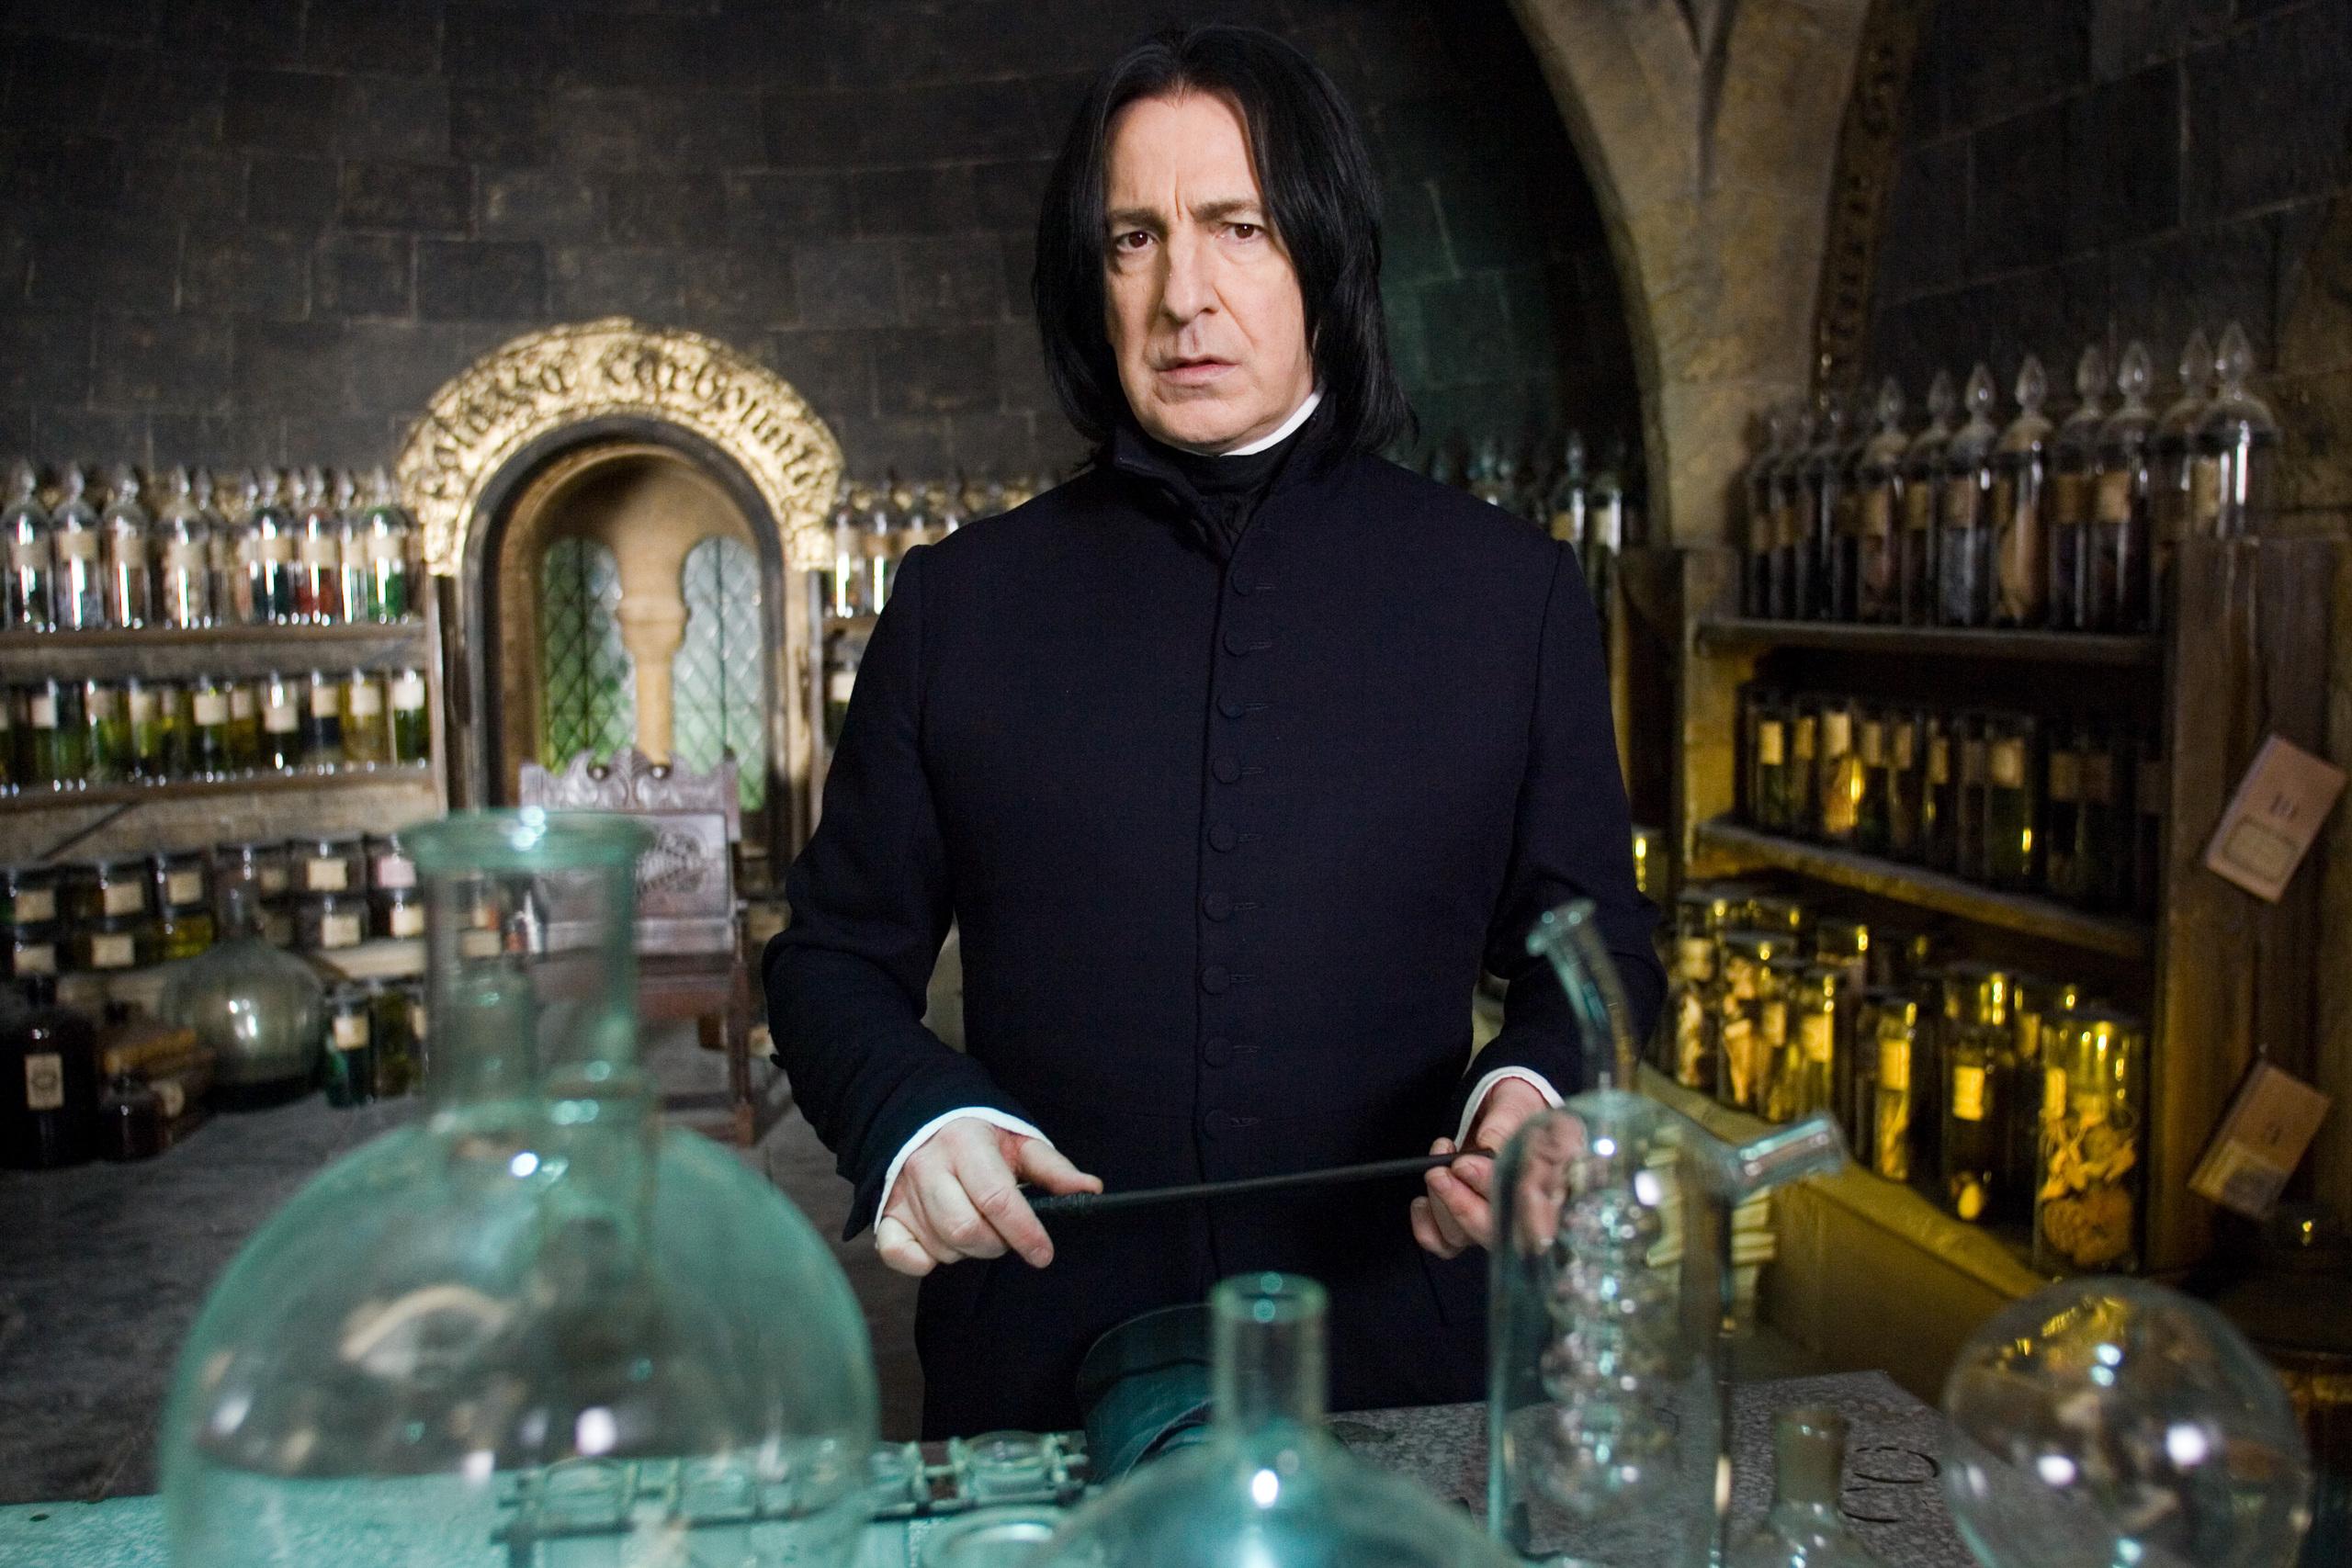 Severus-Snape-rip-severus-snape-13701628-2560-1707